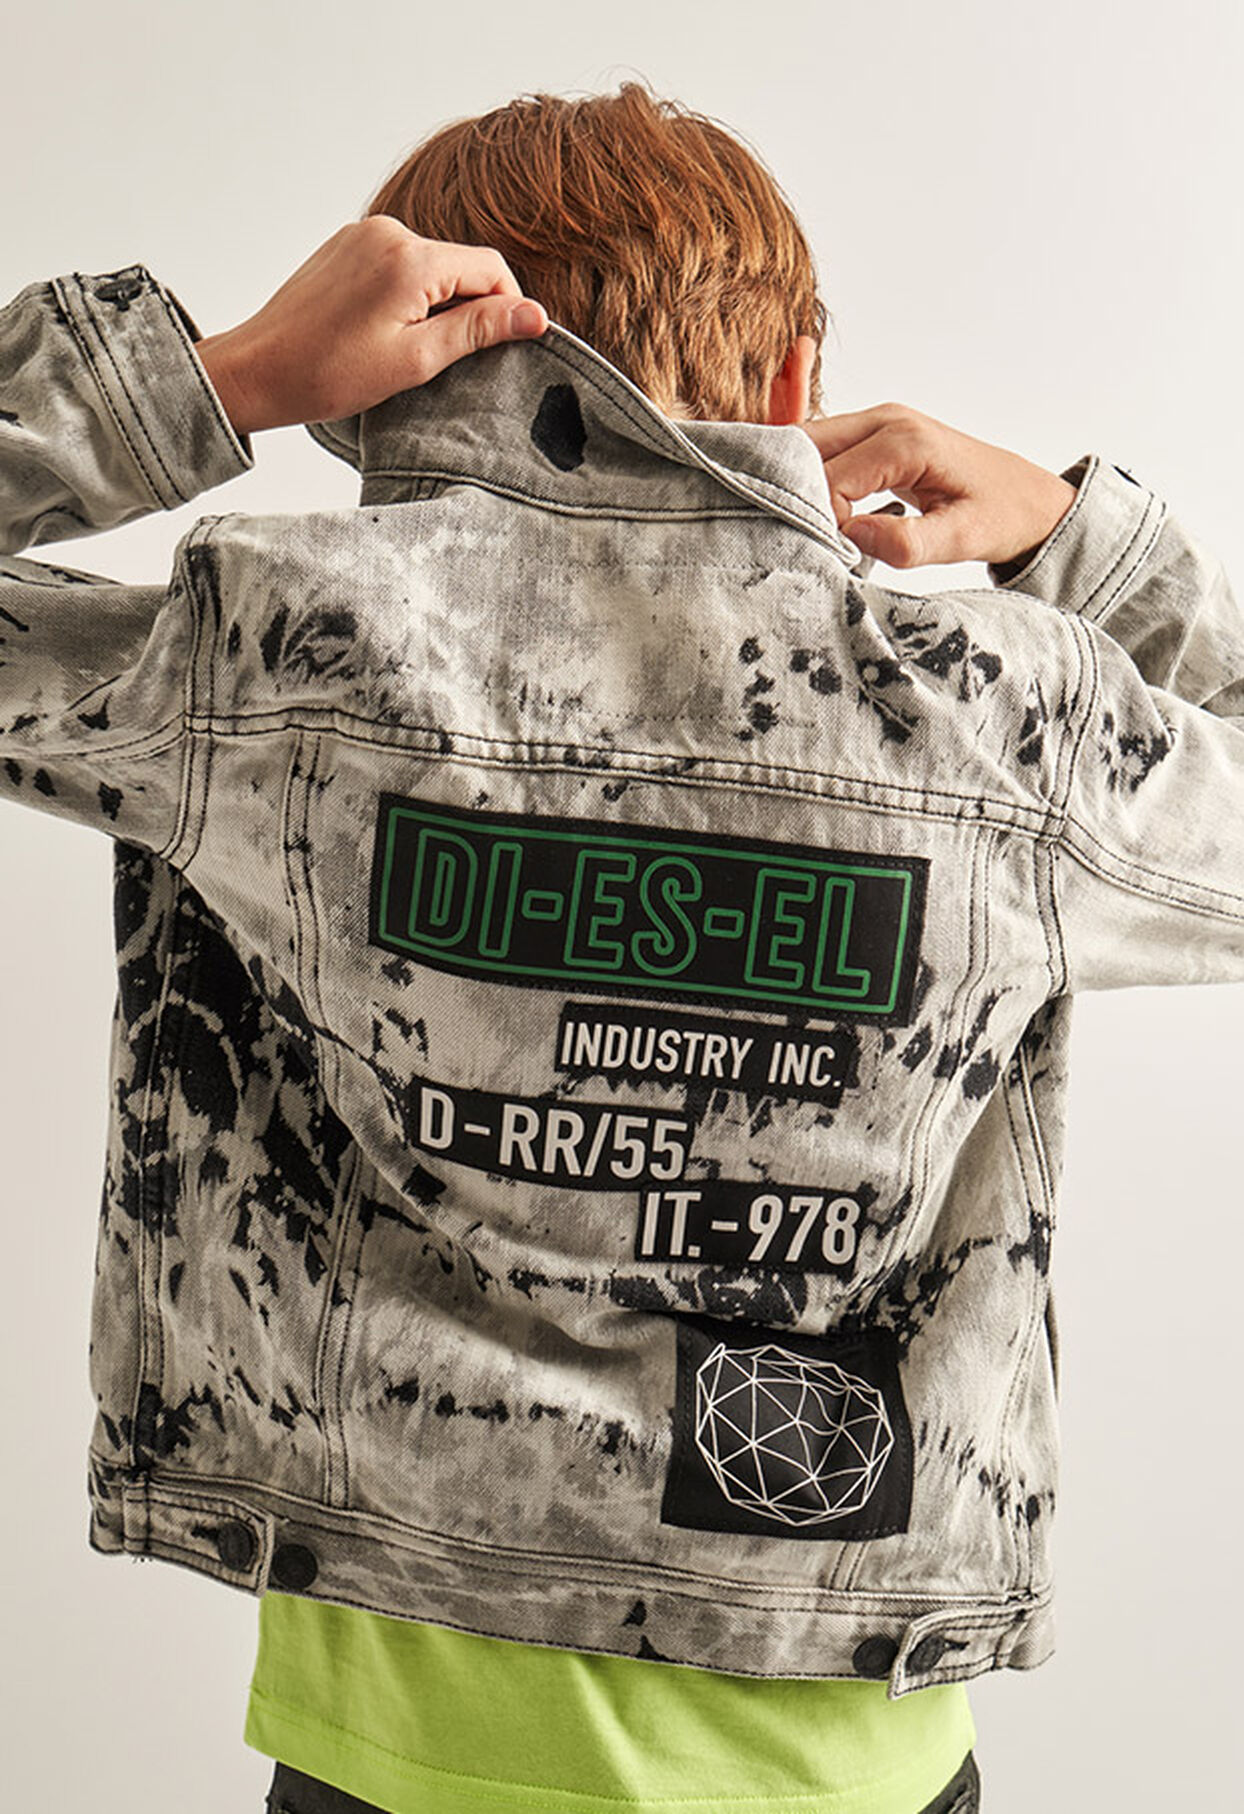 https://gr.diesel.com/dw/image/v2/BBLG_PRD/on/demandware.static/-/Library-Sites-DieselMFSharedLibrary/default/dw9fd09078/CATEGORYOV/2x2_90.jpg?sw=1244&sh=1814